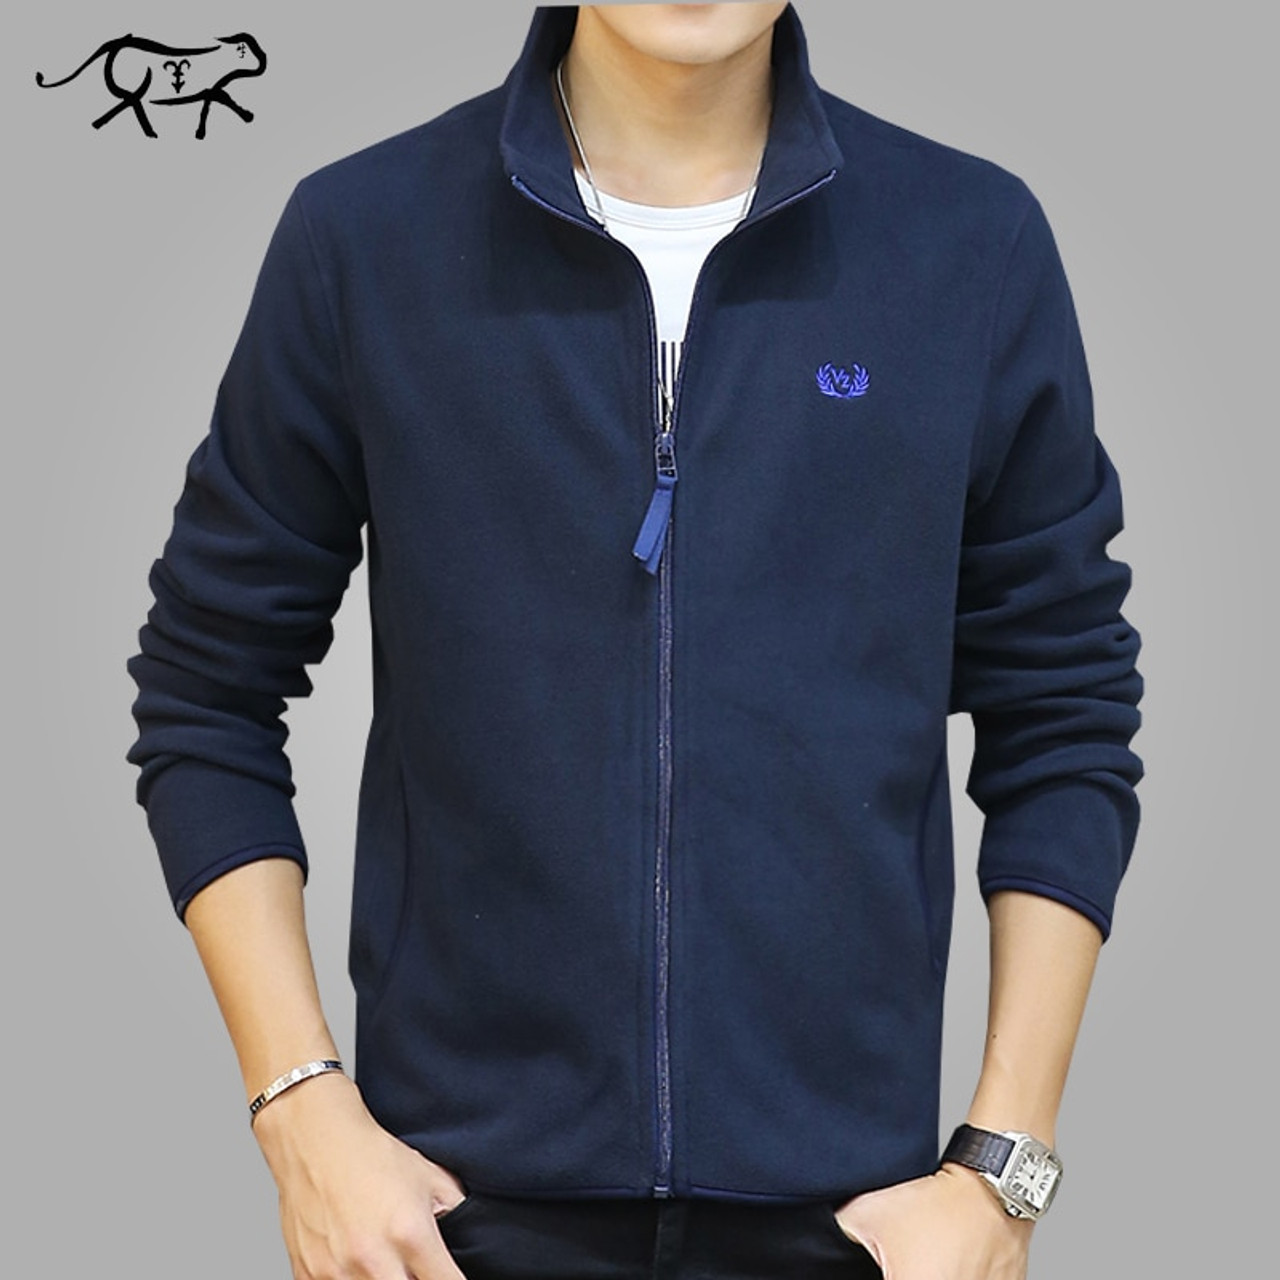 Brand Clothing Jacket Men Fashion Mens Spring Jacket Casual Slim Fit Outerwear  Fleece Men's Jackets and Coats Jaqueta Masculina - OnshopDeals.Com